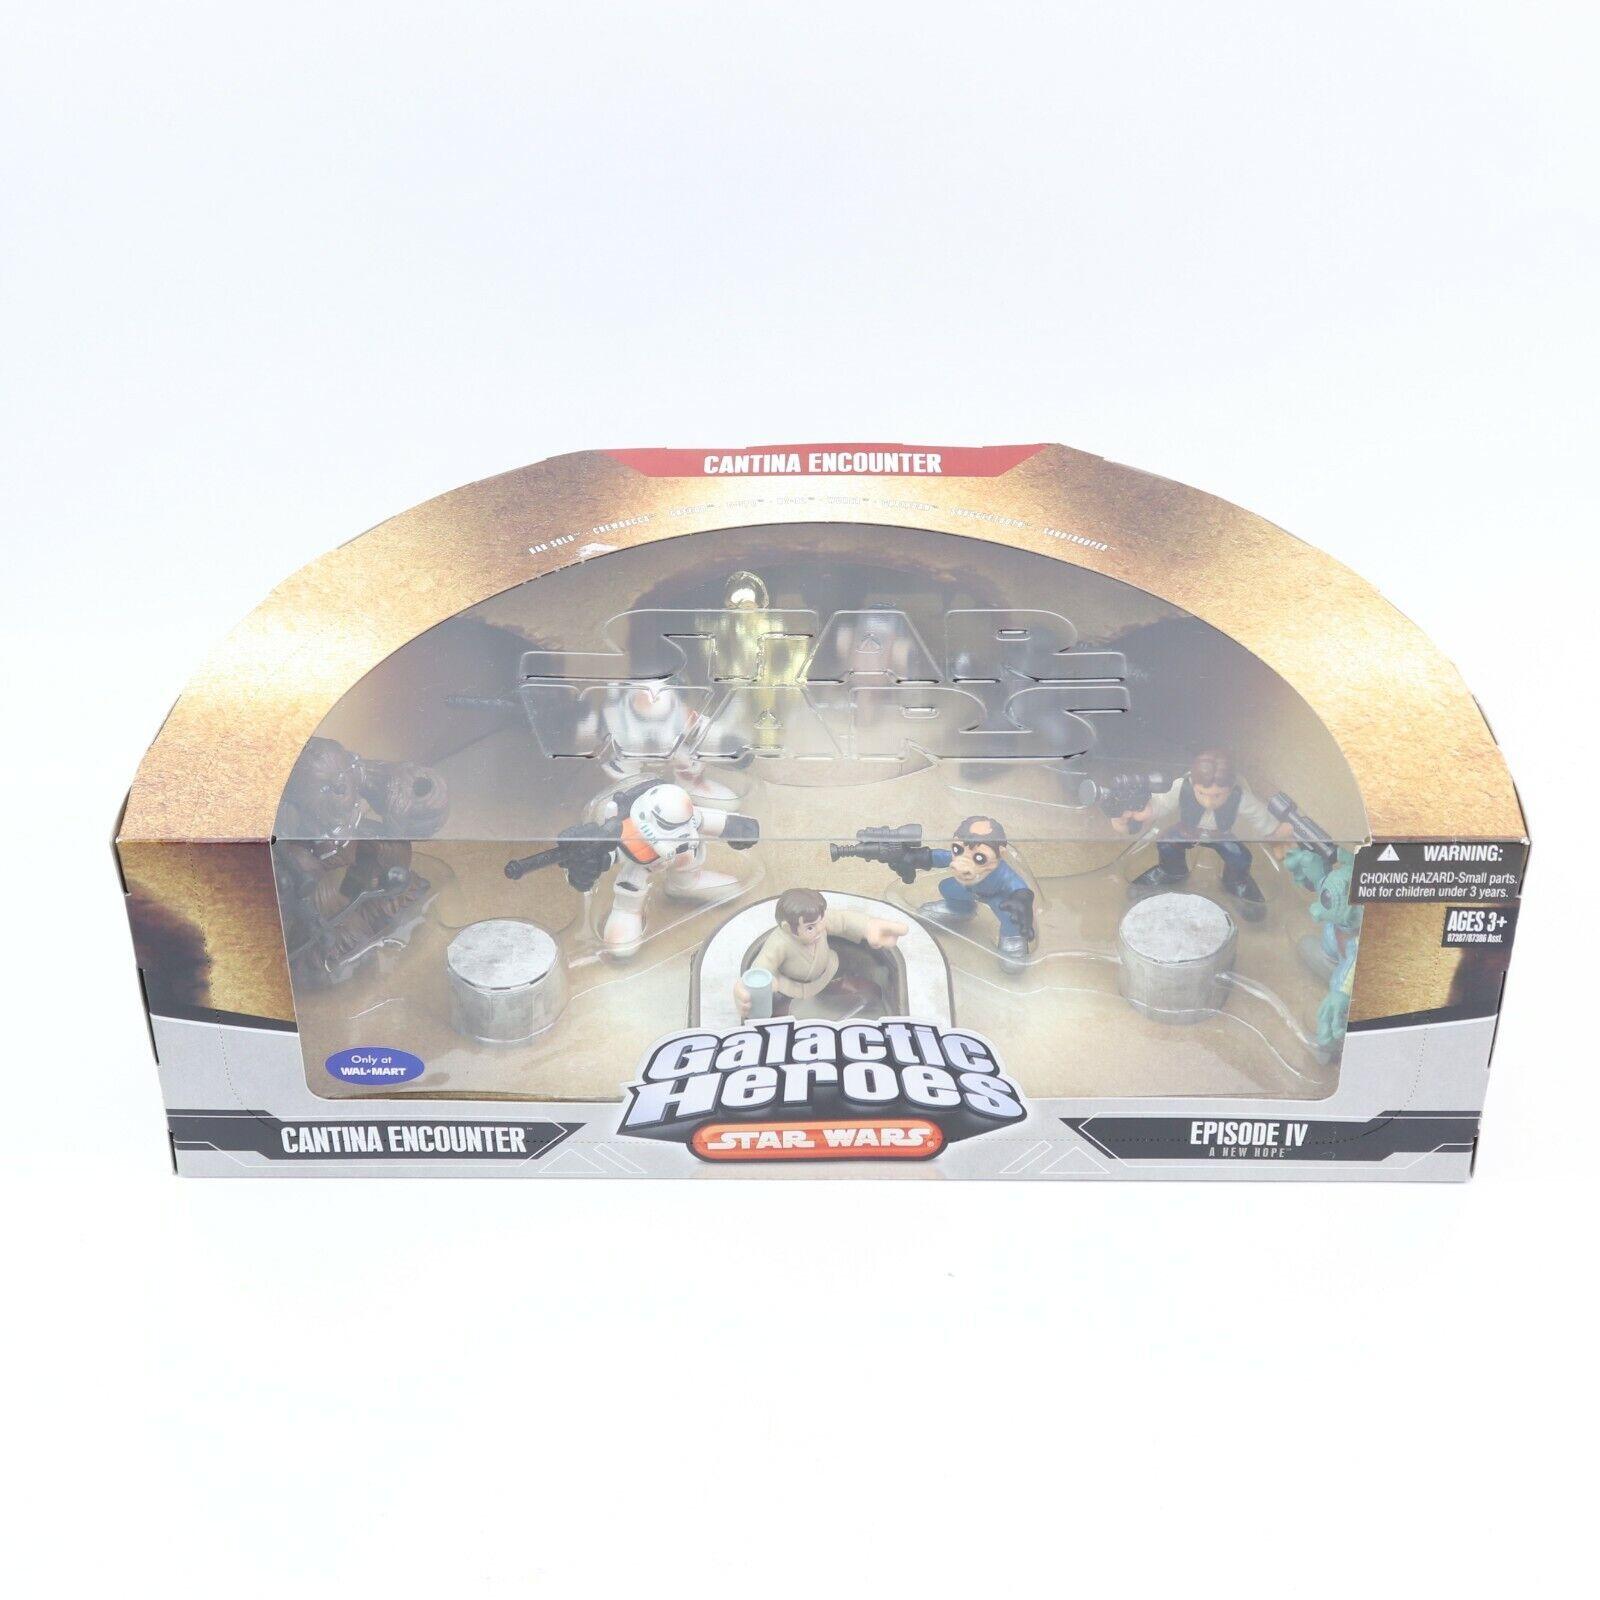 Star Wars Galactic Heroes Deluxe Cinema Scene Mini Figure Cantina Encounter